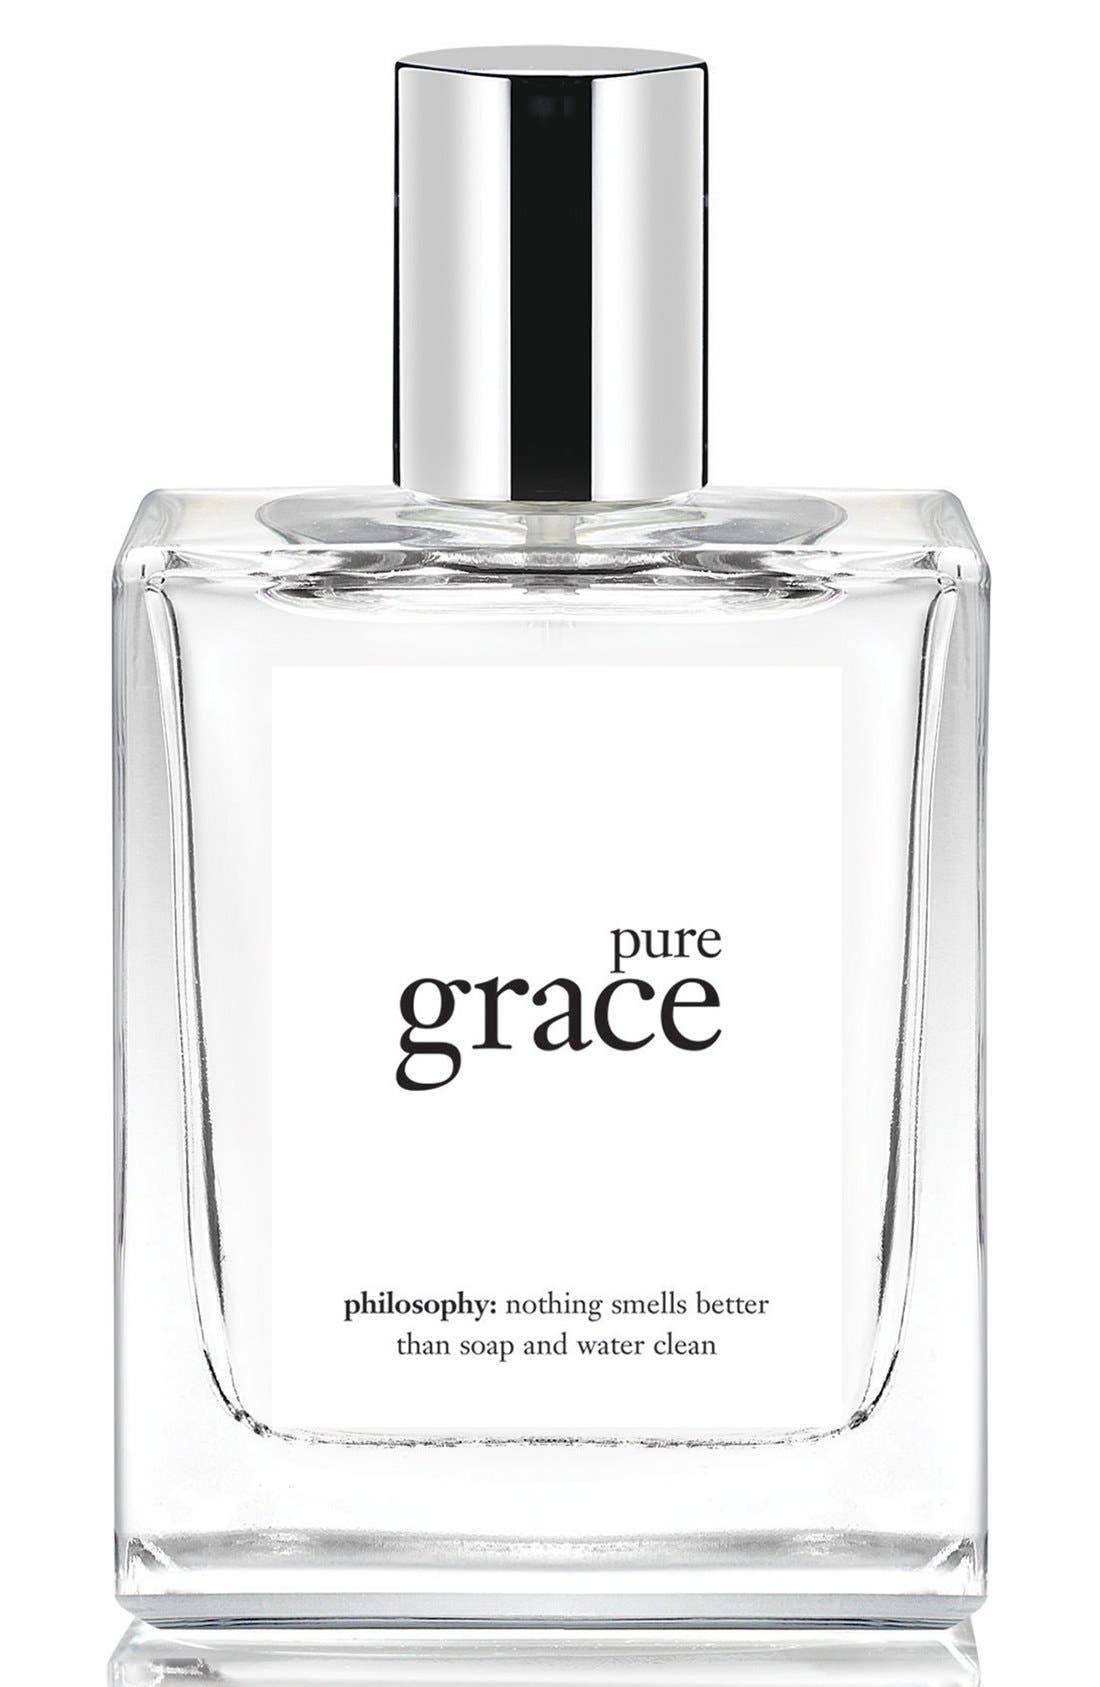 philosophy 'pure grace' spray fragrance